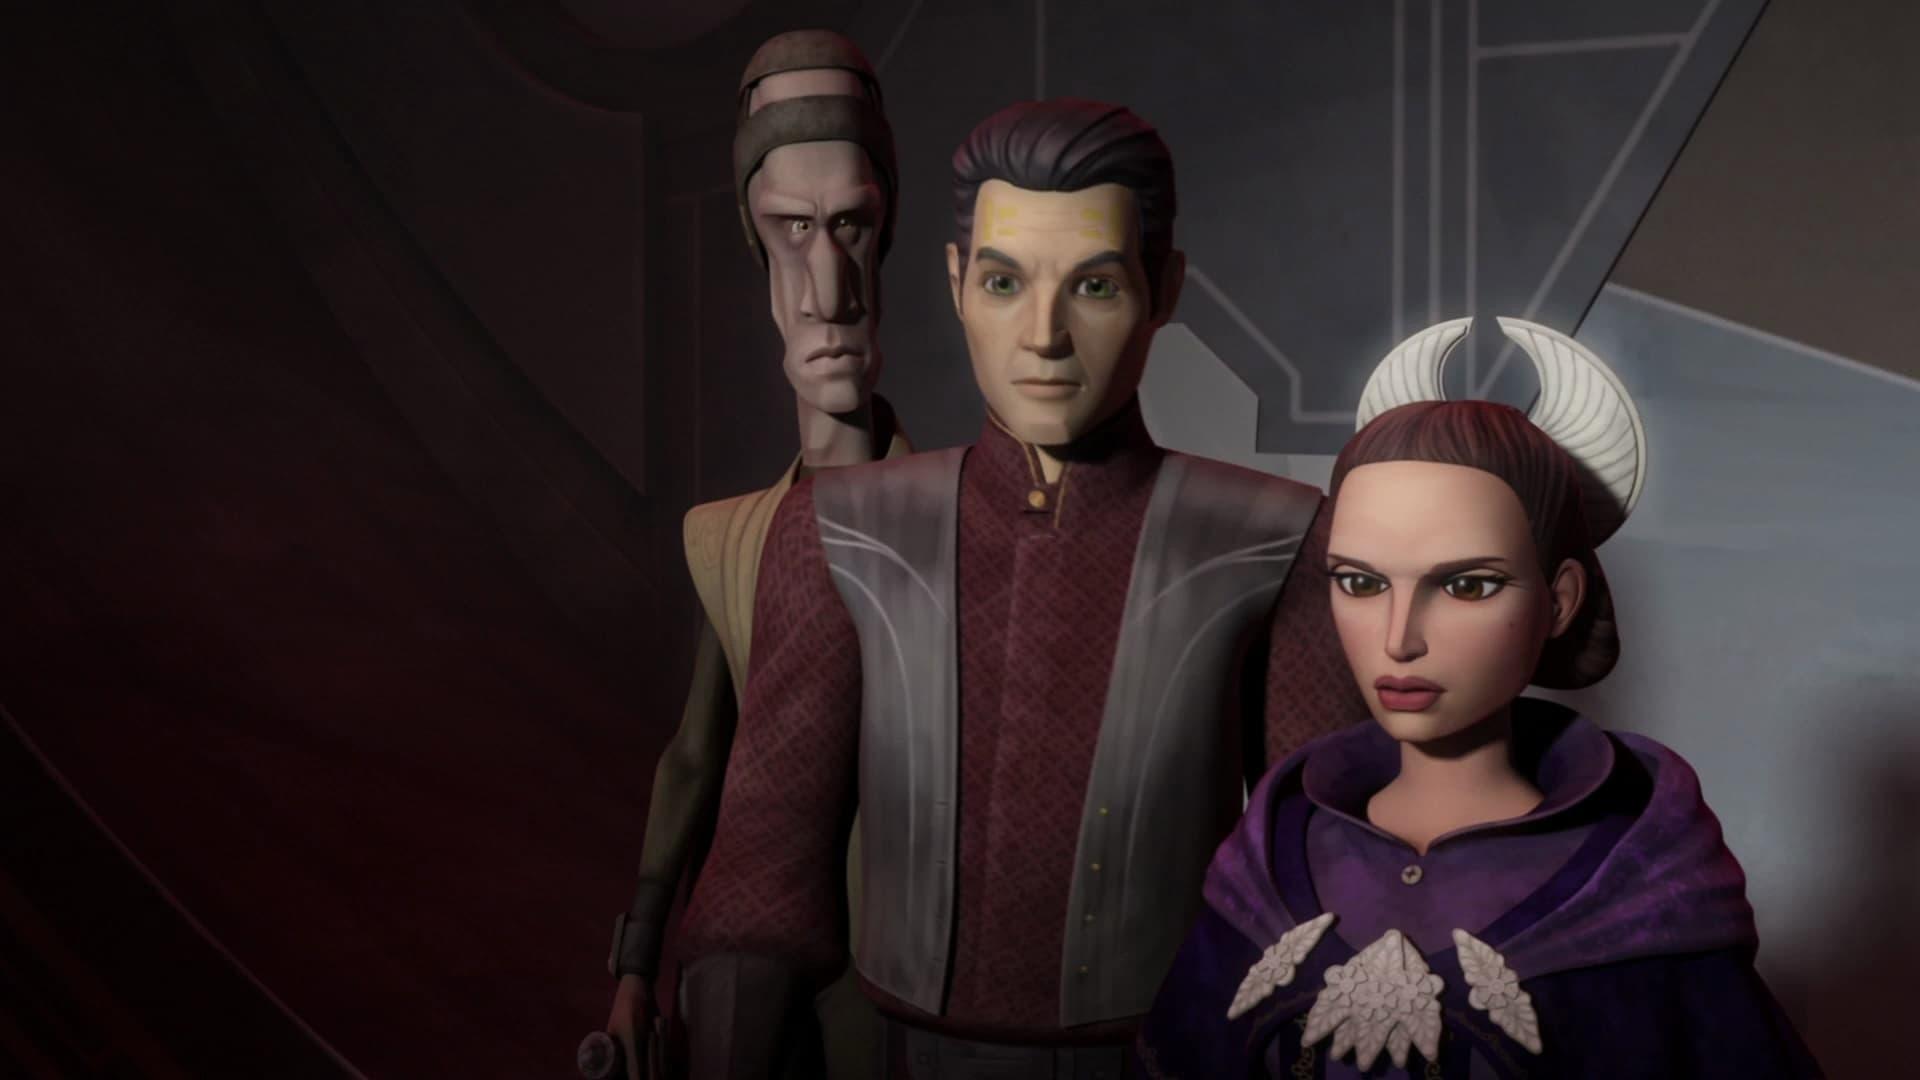 Star Wars: The Clone Wars - Season 6 Episode 5 : An Old Friend